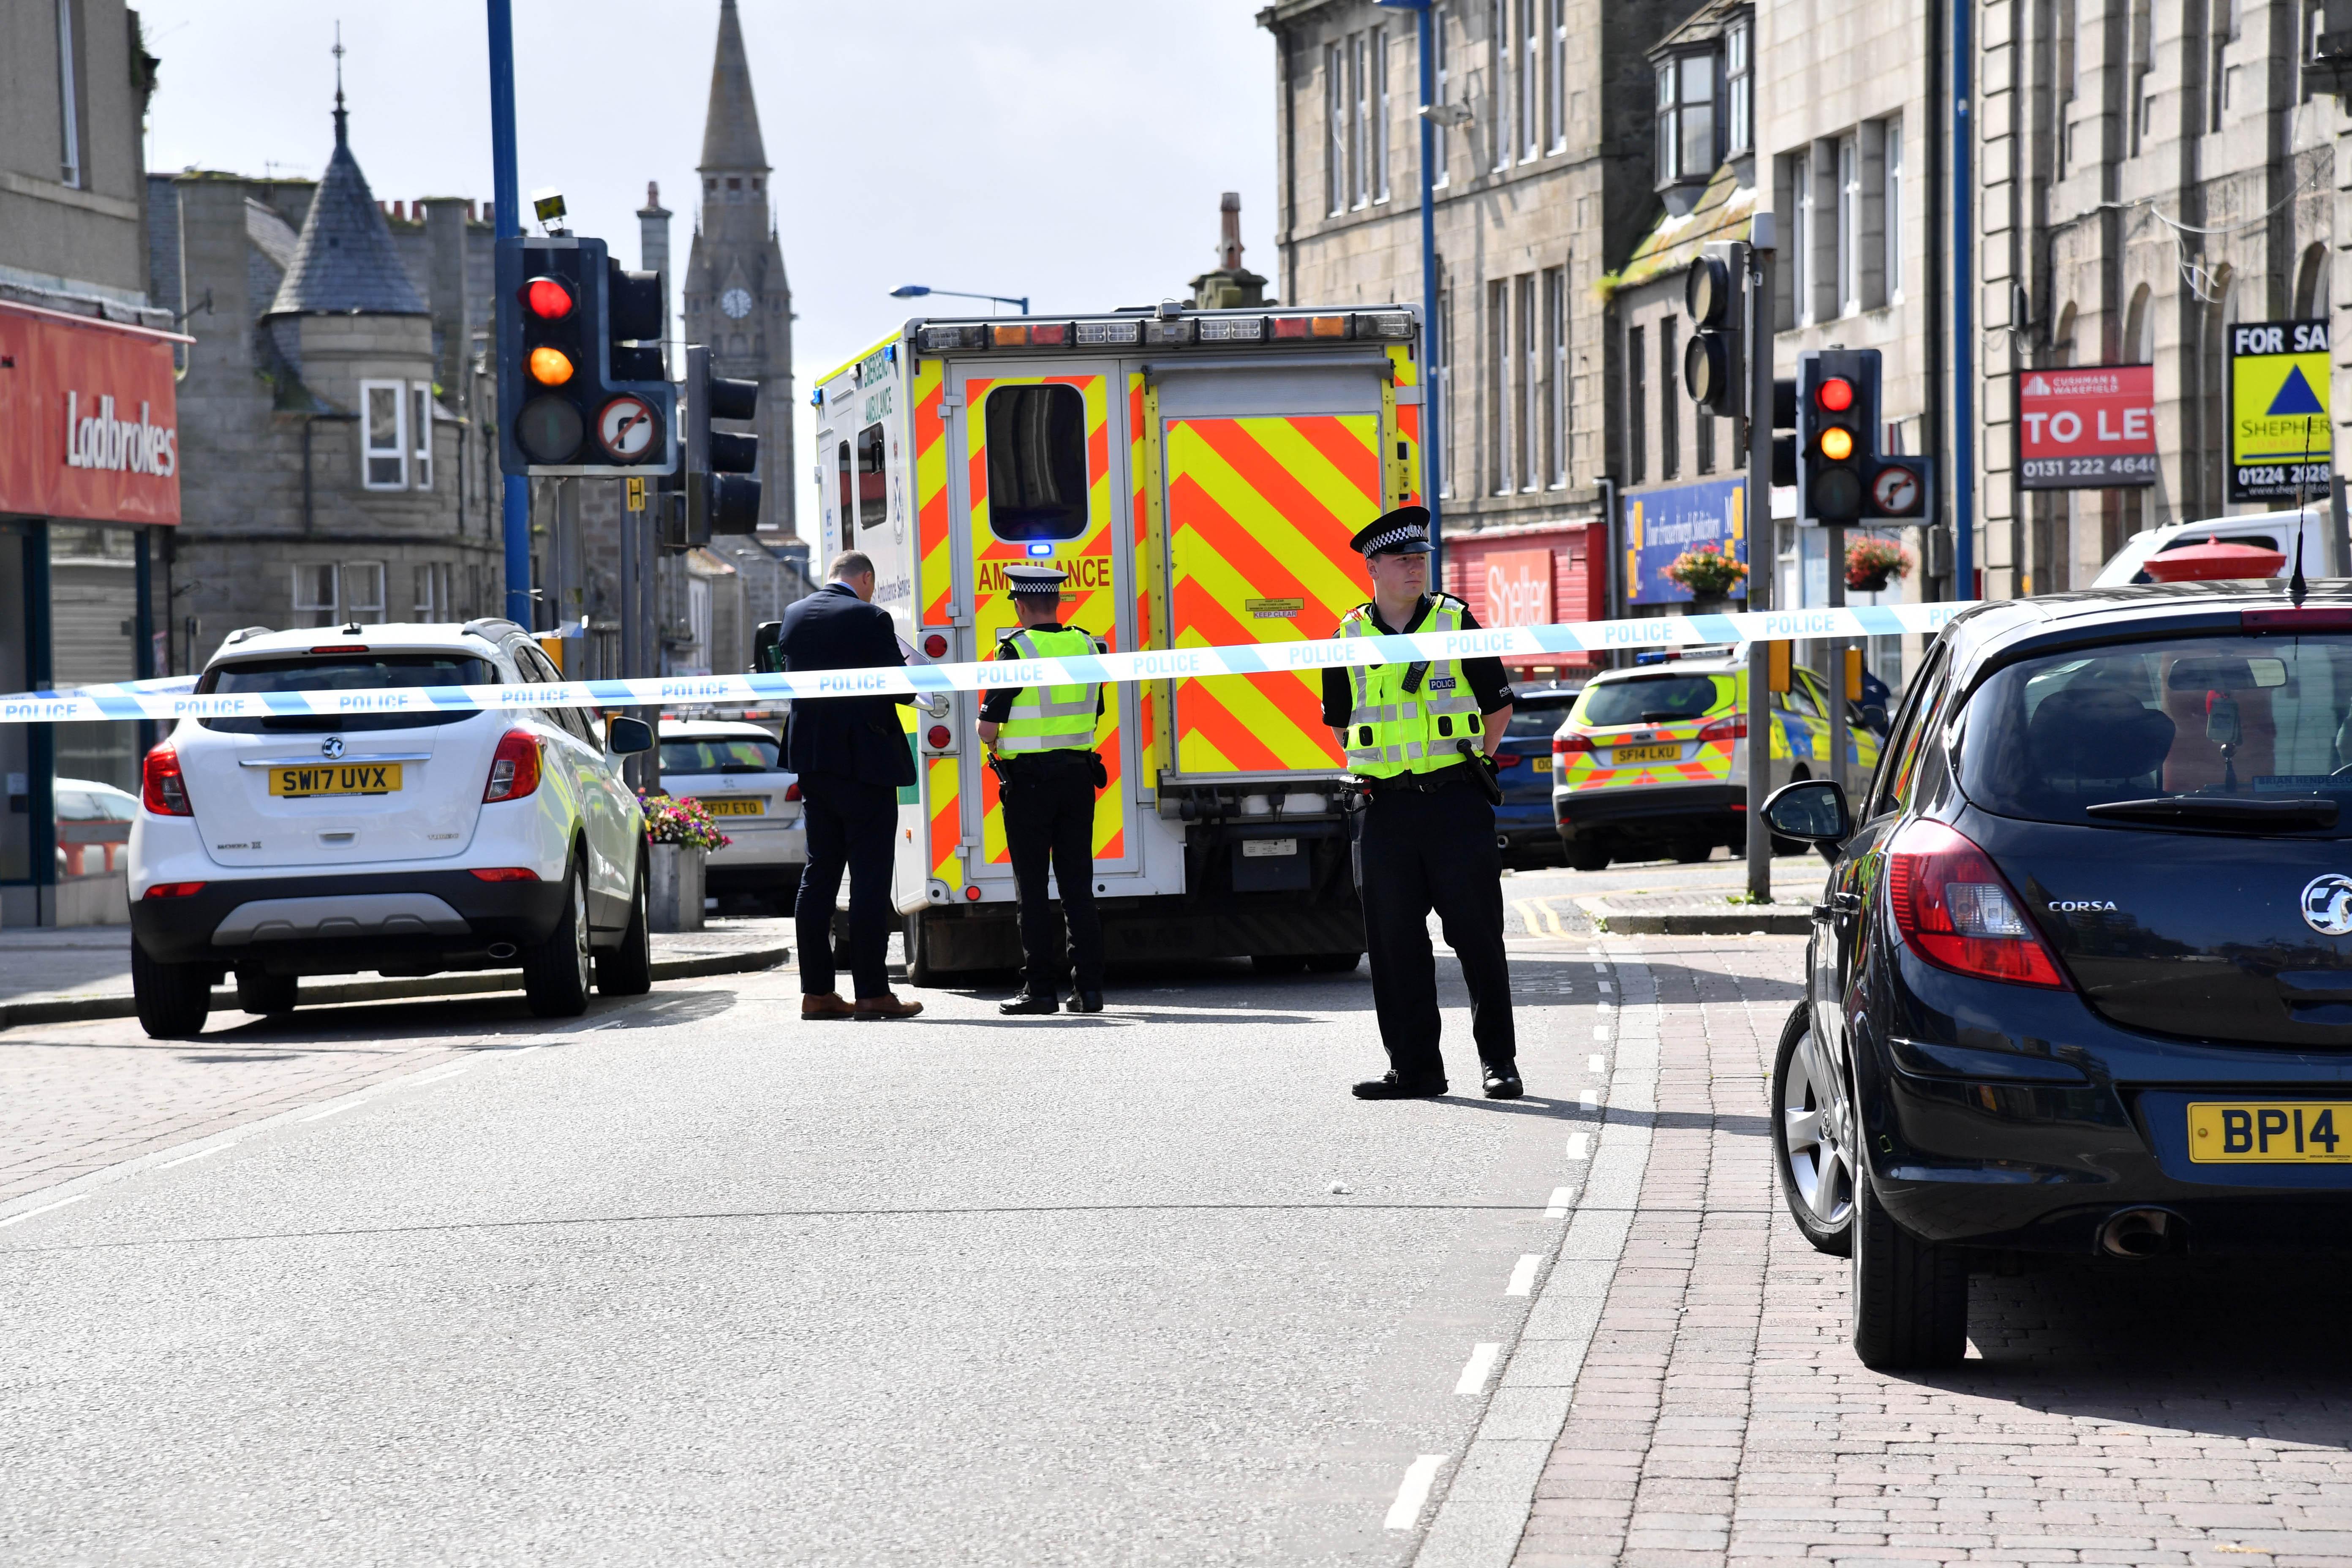 The scene on Broad Street, Fraserburgh